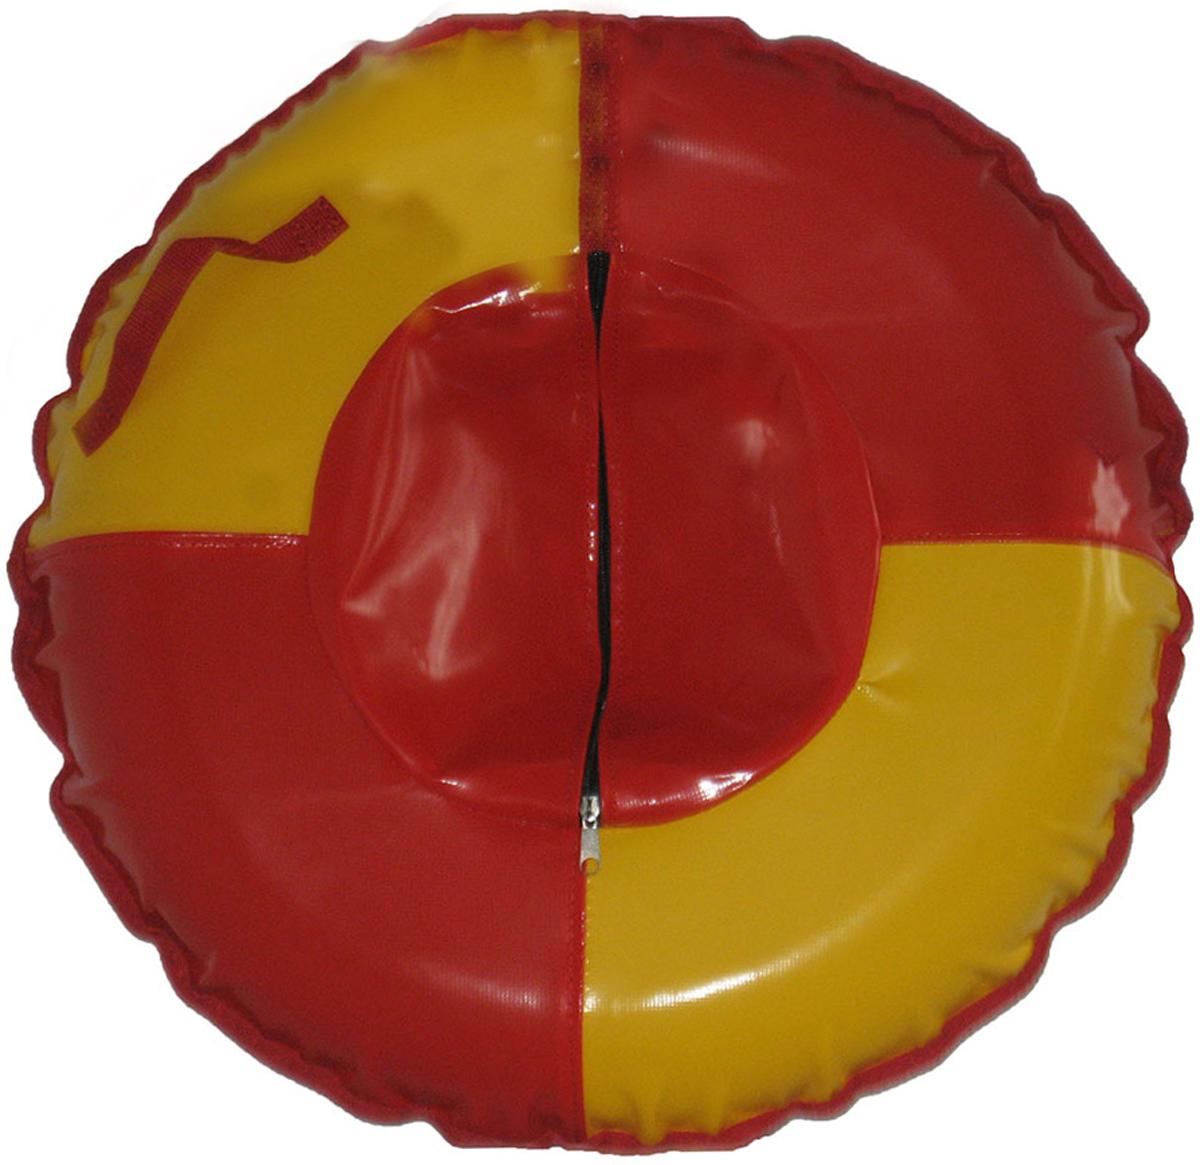 Тюбинг FormulaZima Вихрь, 55017-3, красный, желтый, диаметр 120 см тюбинг formulazima вихрь цвет черный оранжевый диаметр 100 см